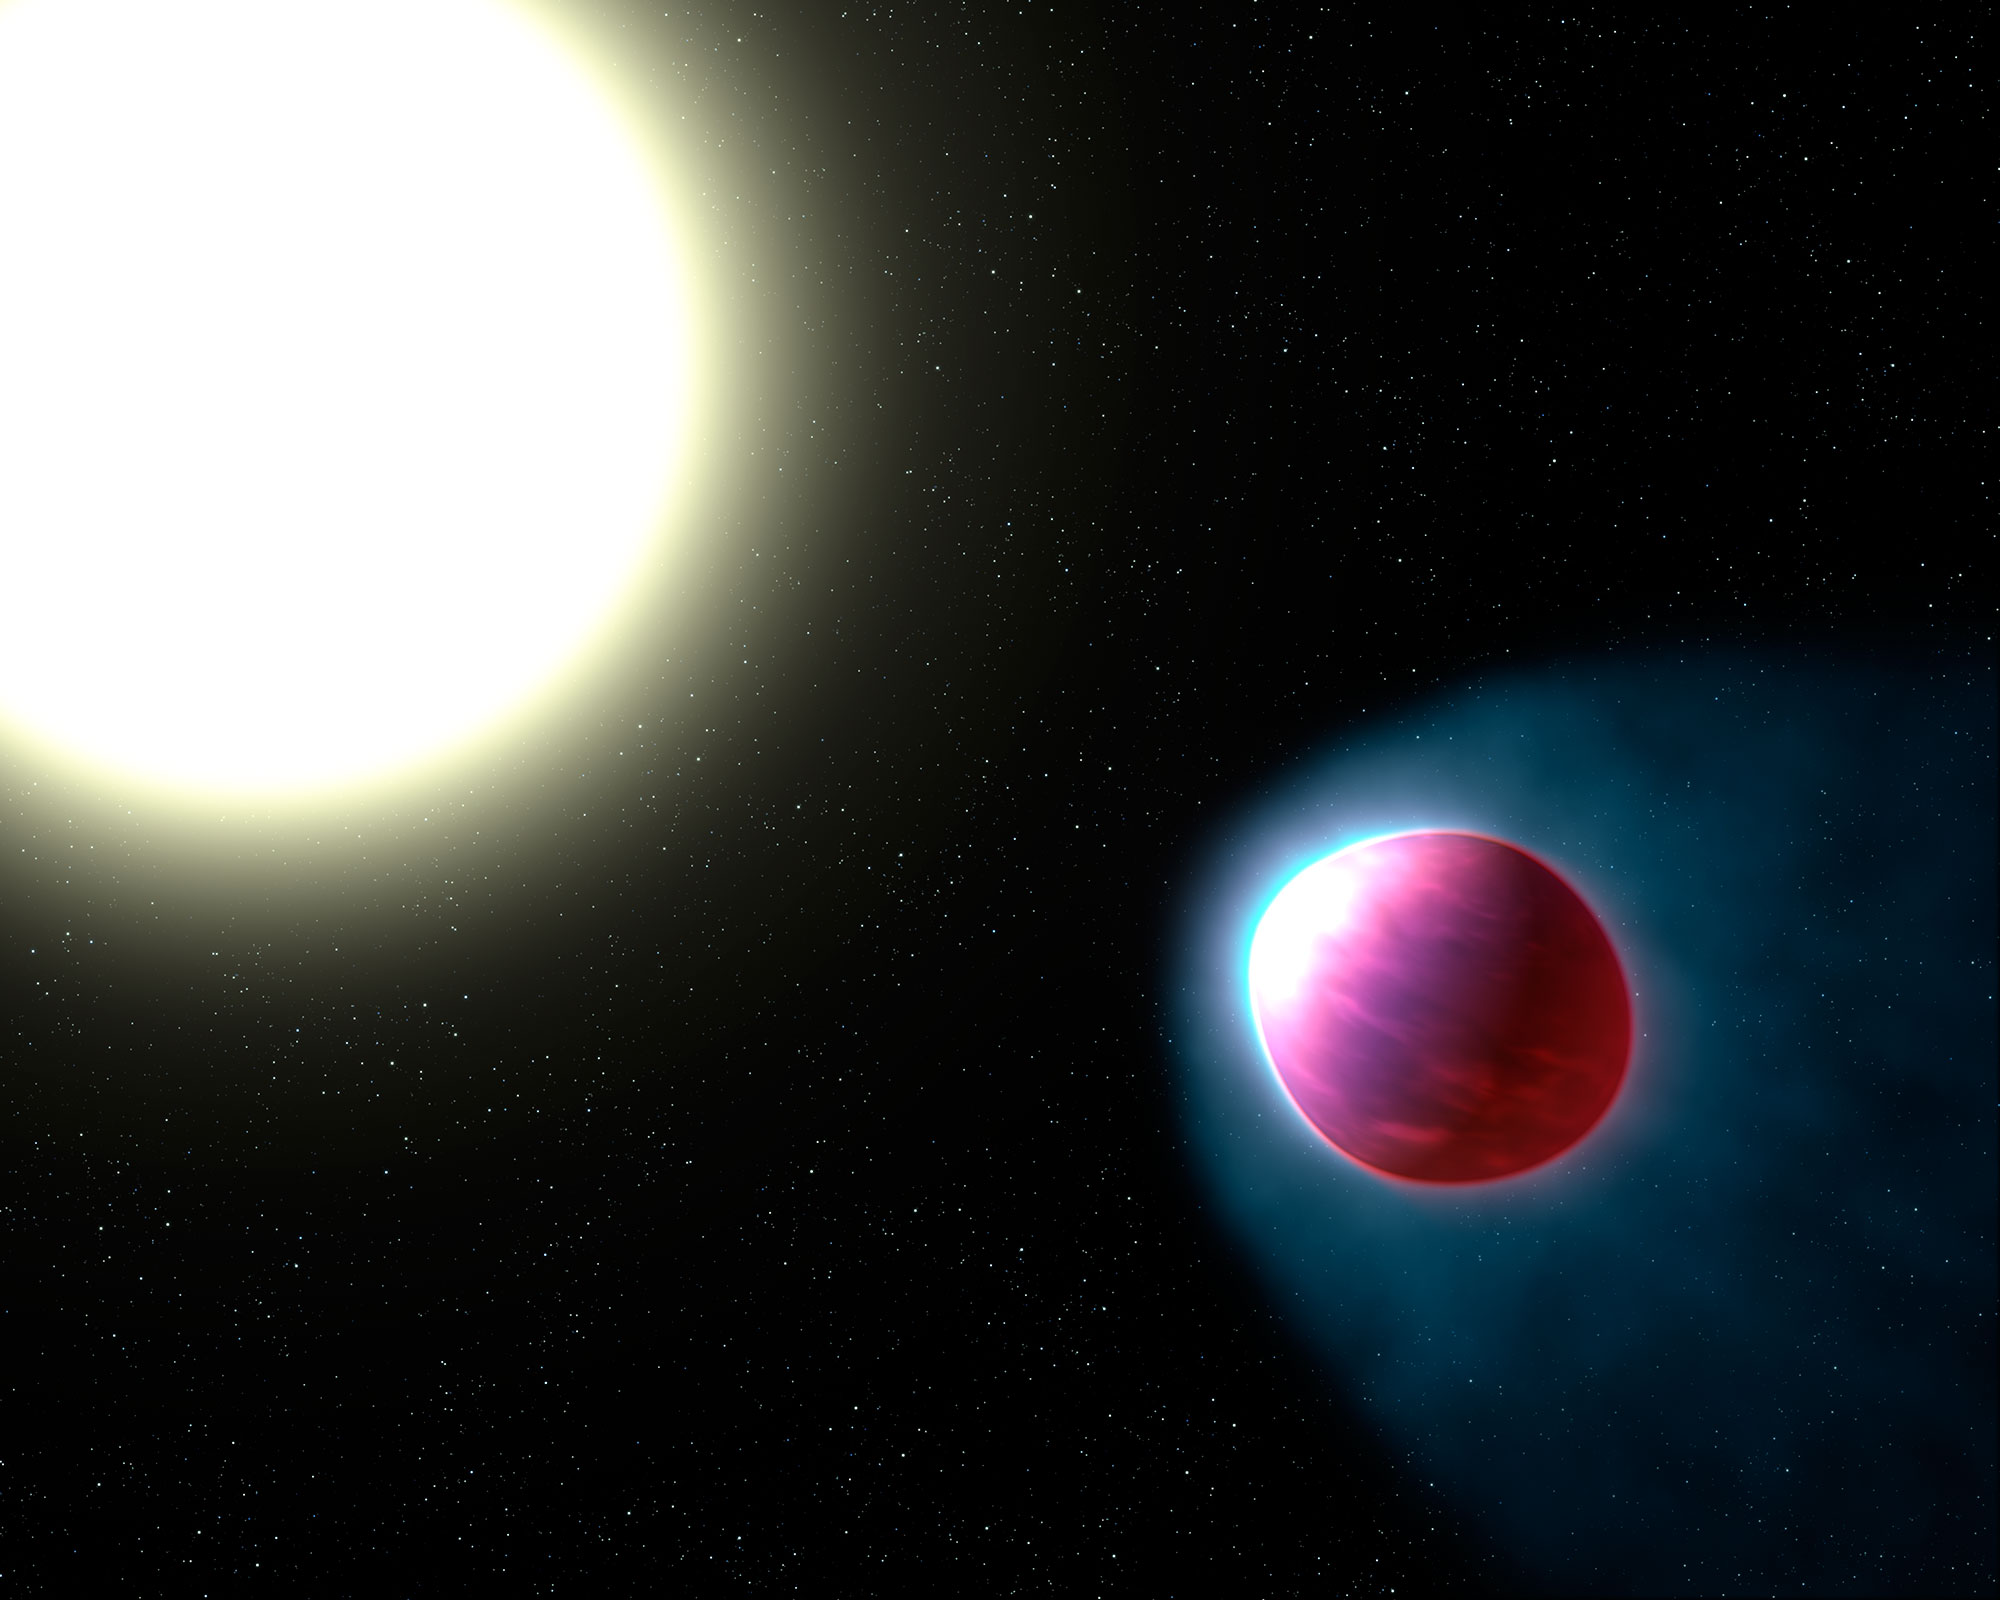 El Hubble detecta la primera estratosfera de un exoplaneta.